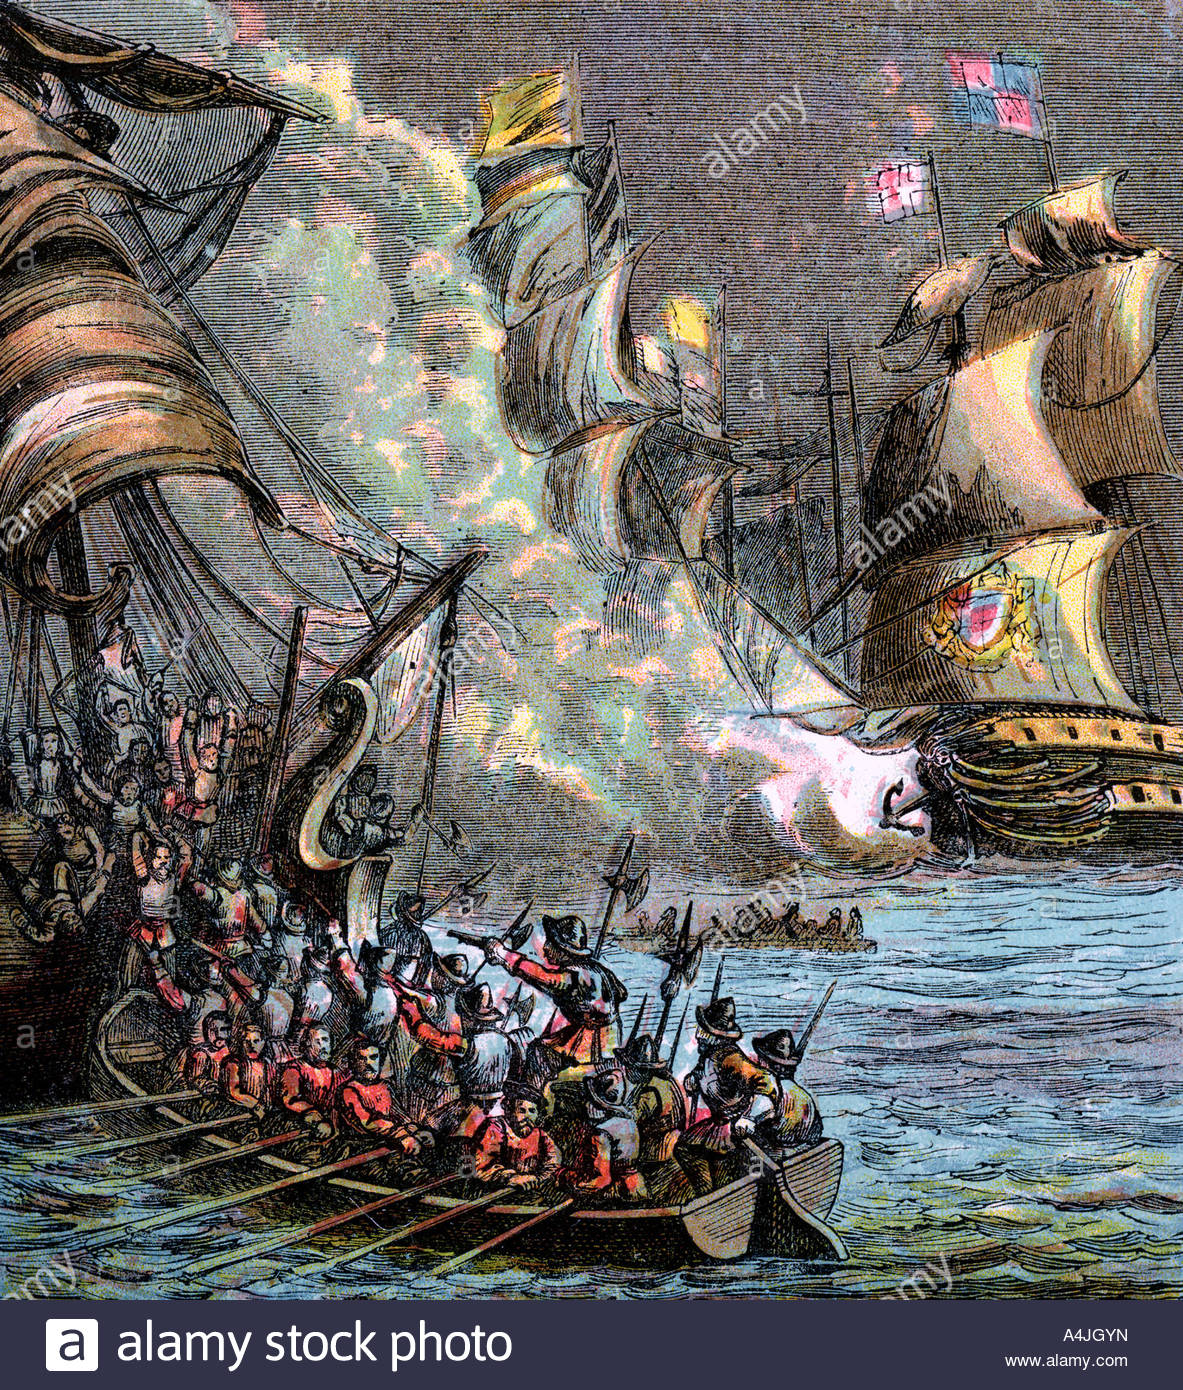 The Spanish Armada 1588 c1850 - Stock Image